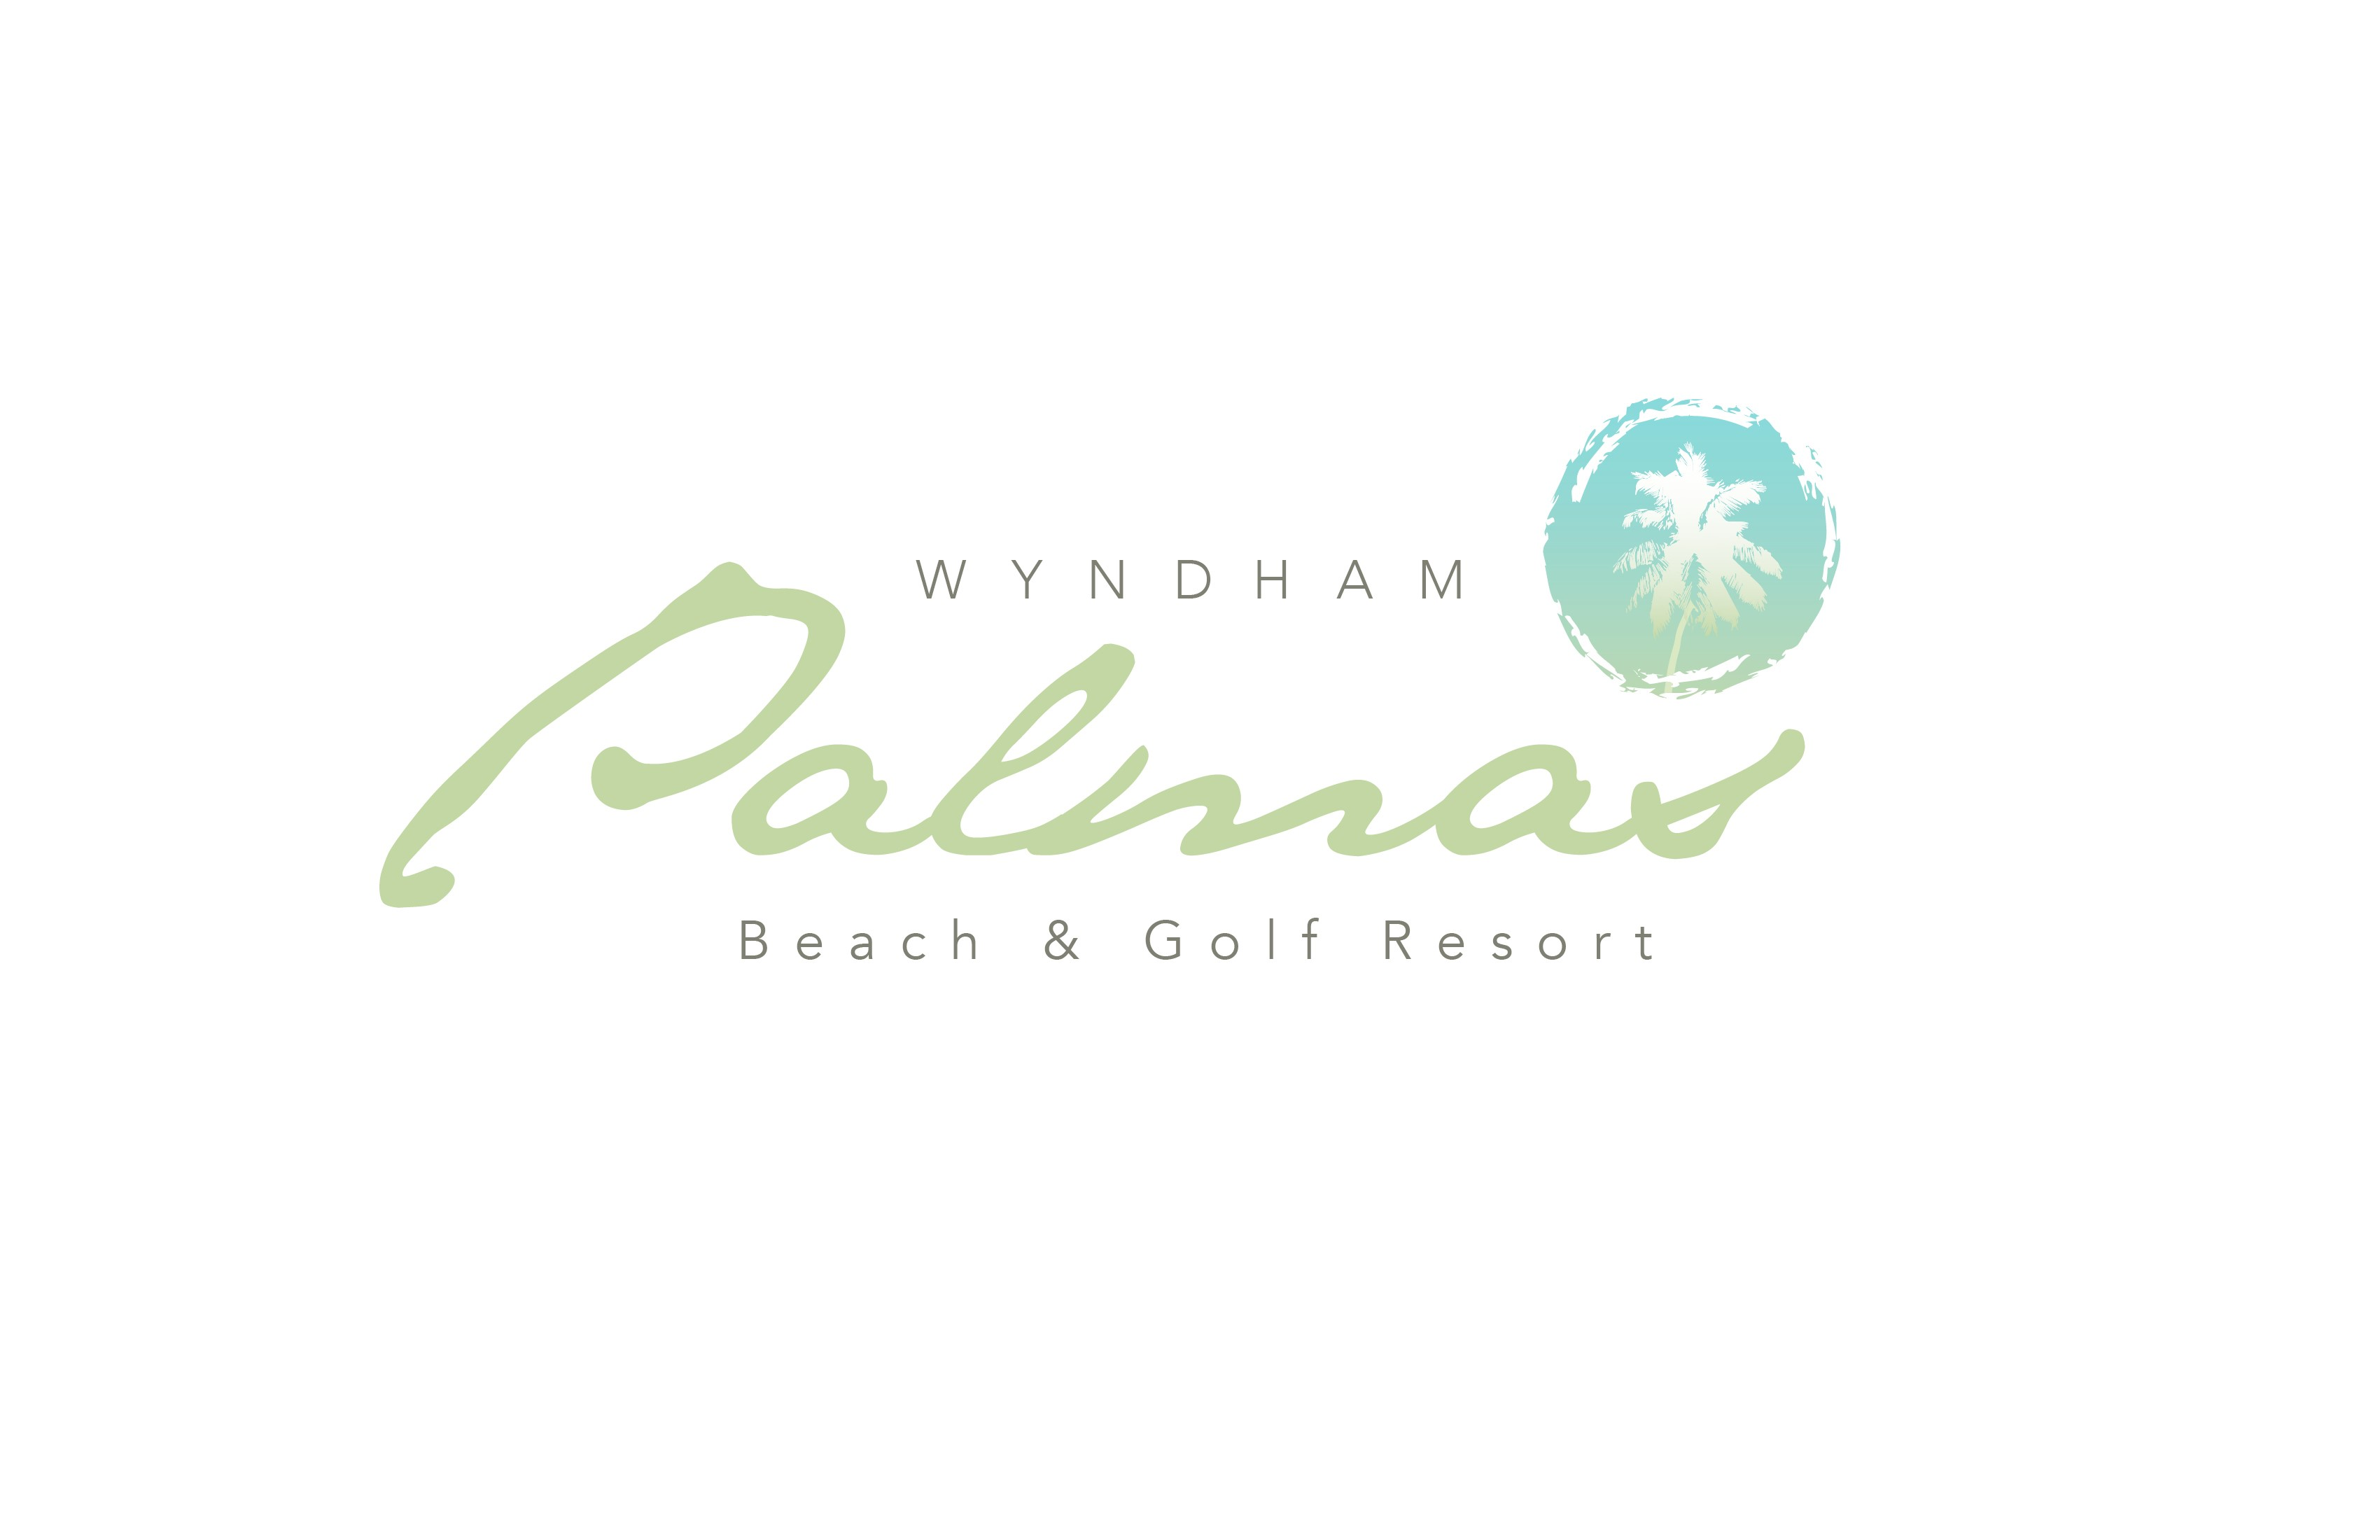 Wyndham Palmas Beach and Golf Resort